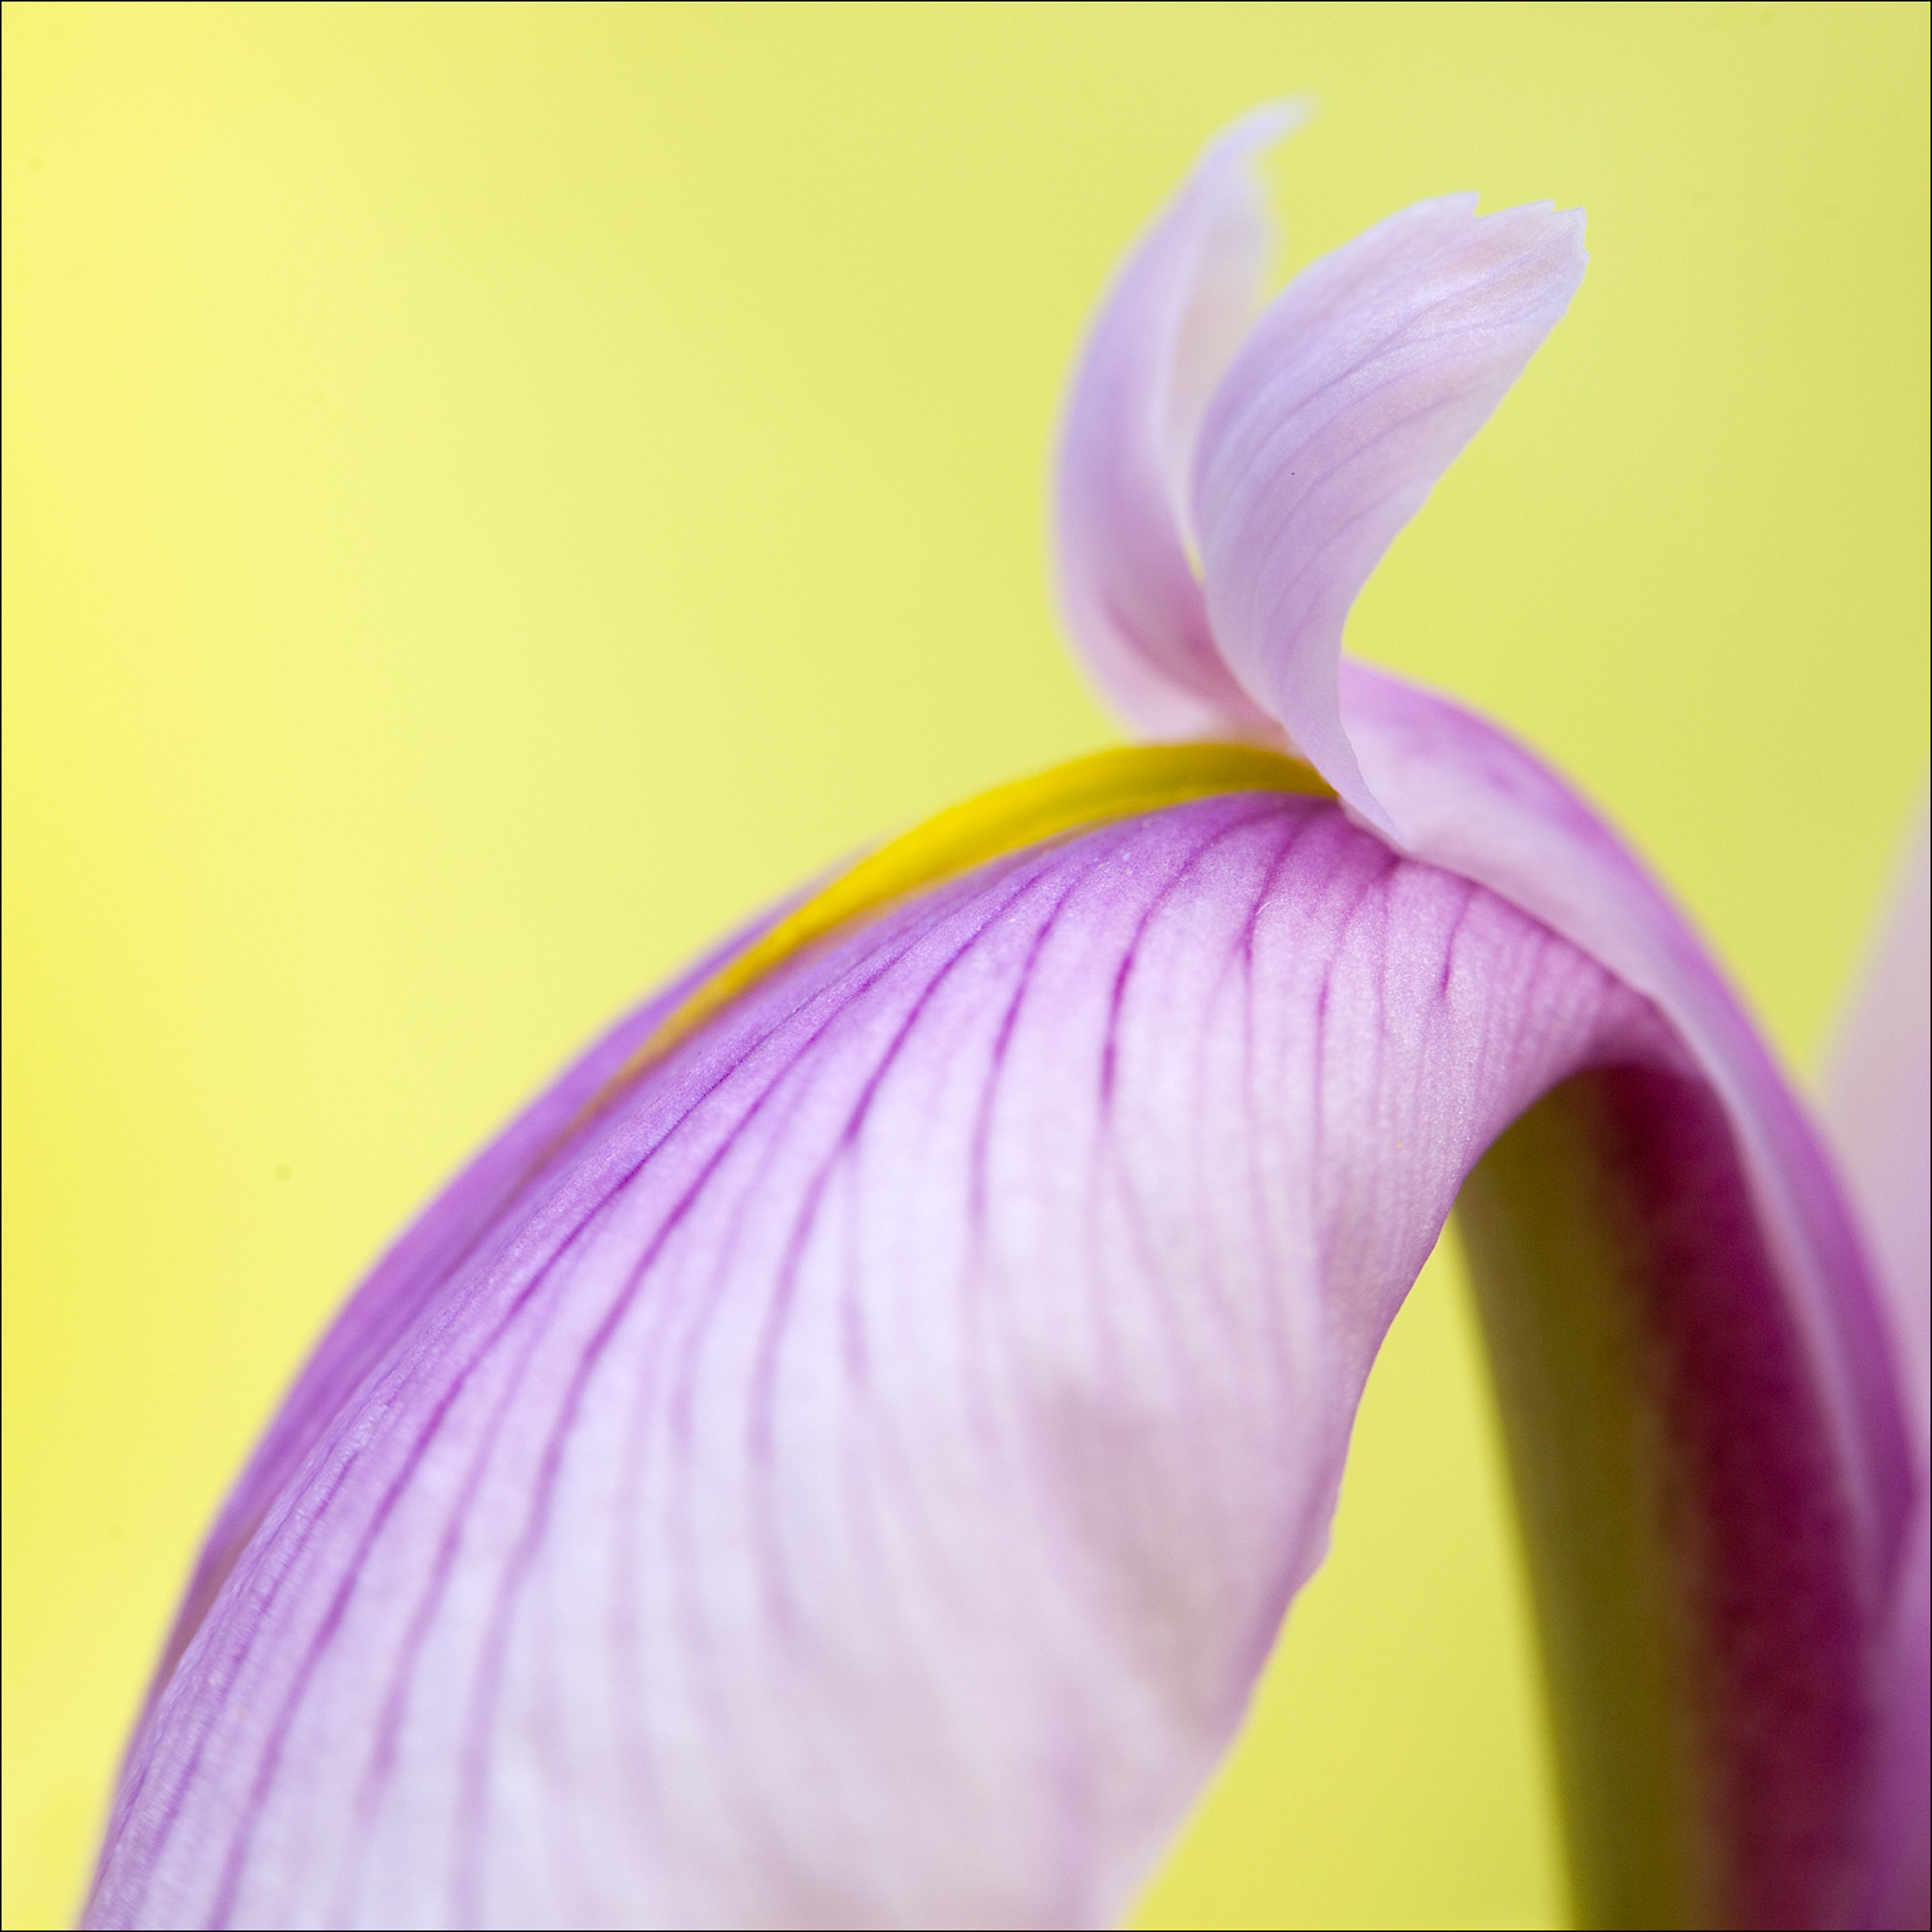 Lavendar and Yellow 1.jpg